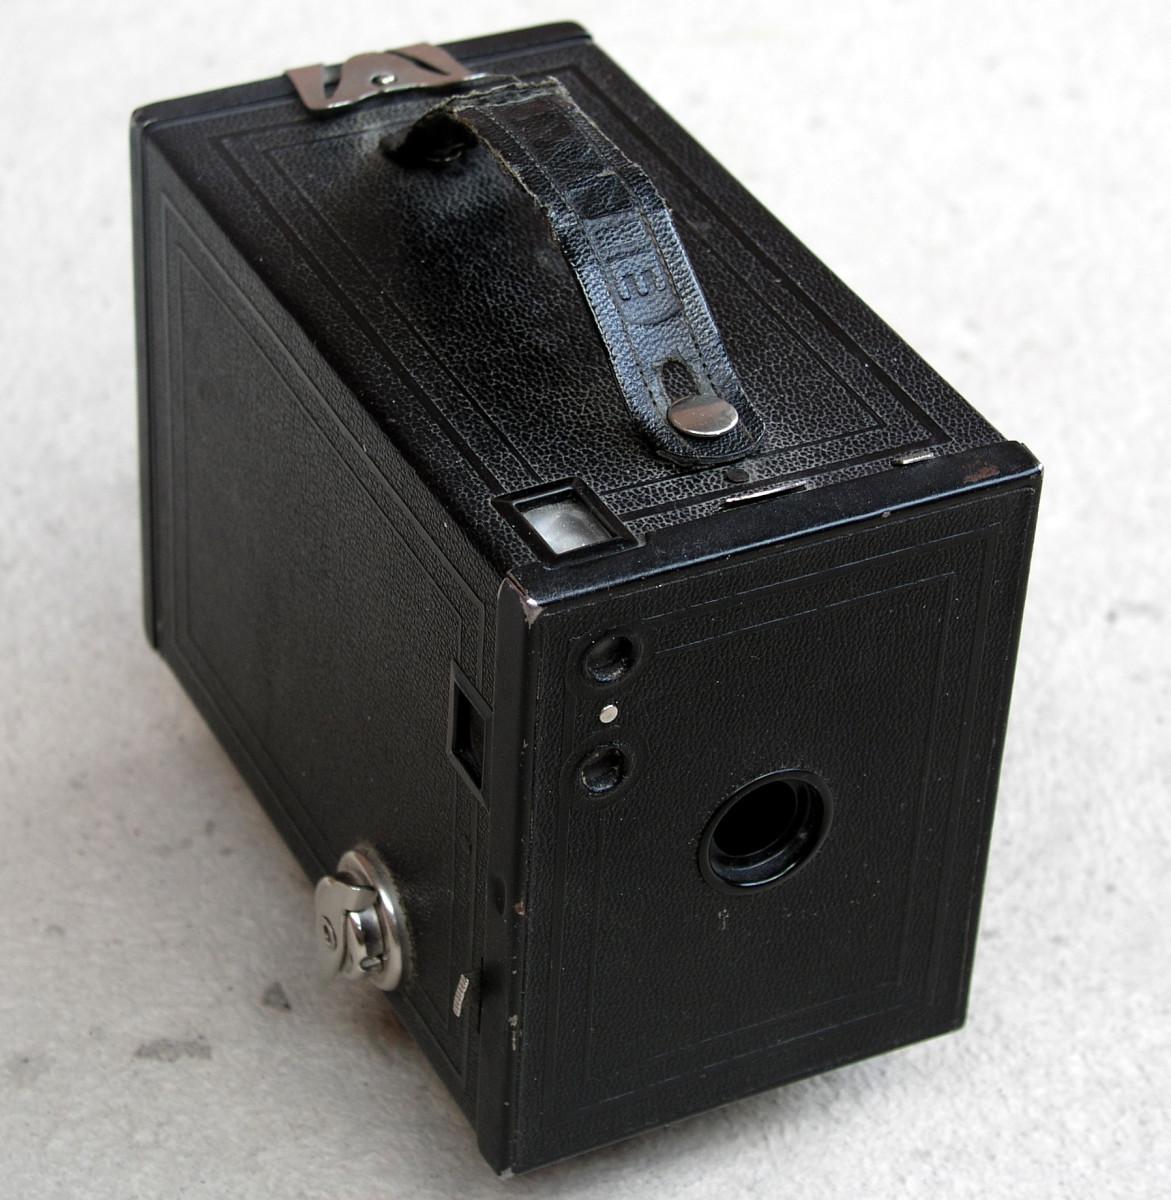 1910 Brownie Box Camera